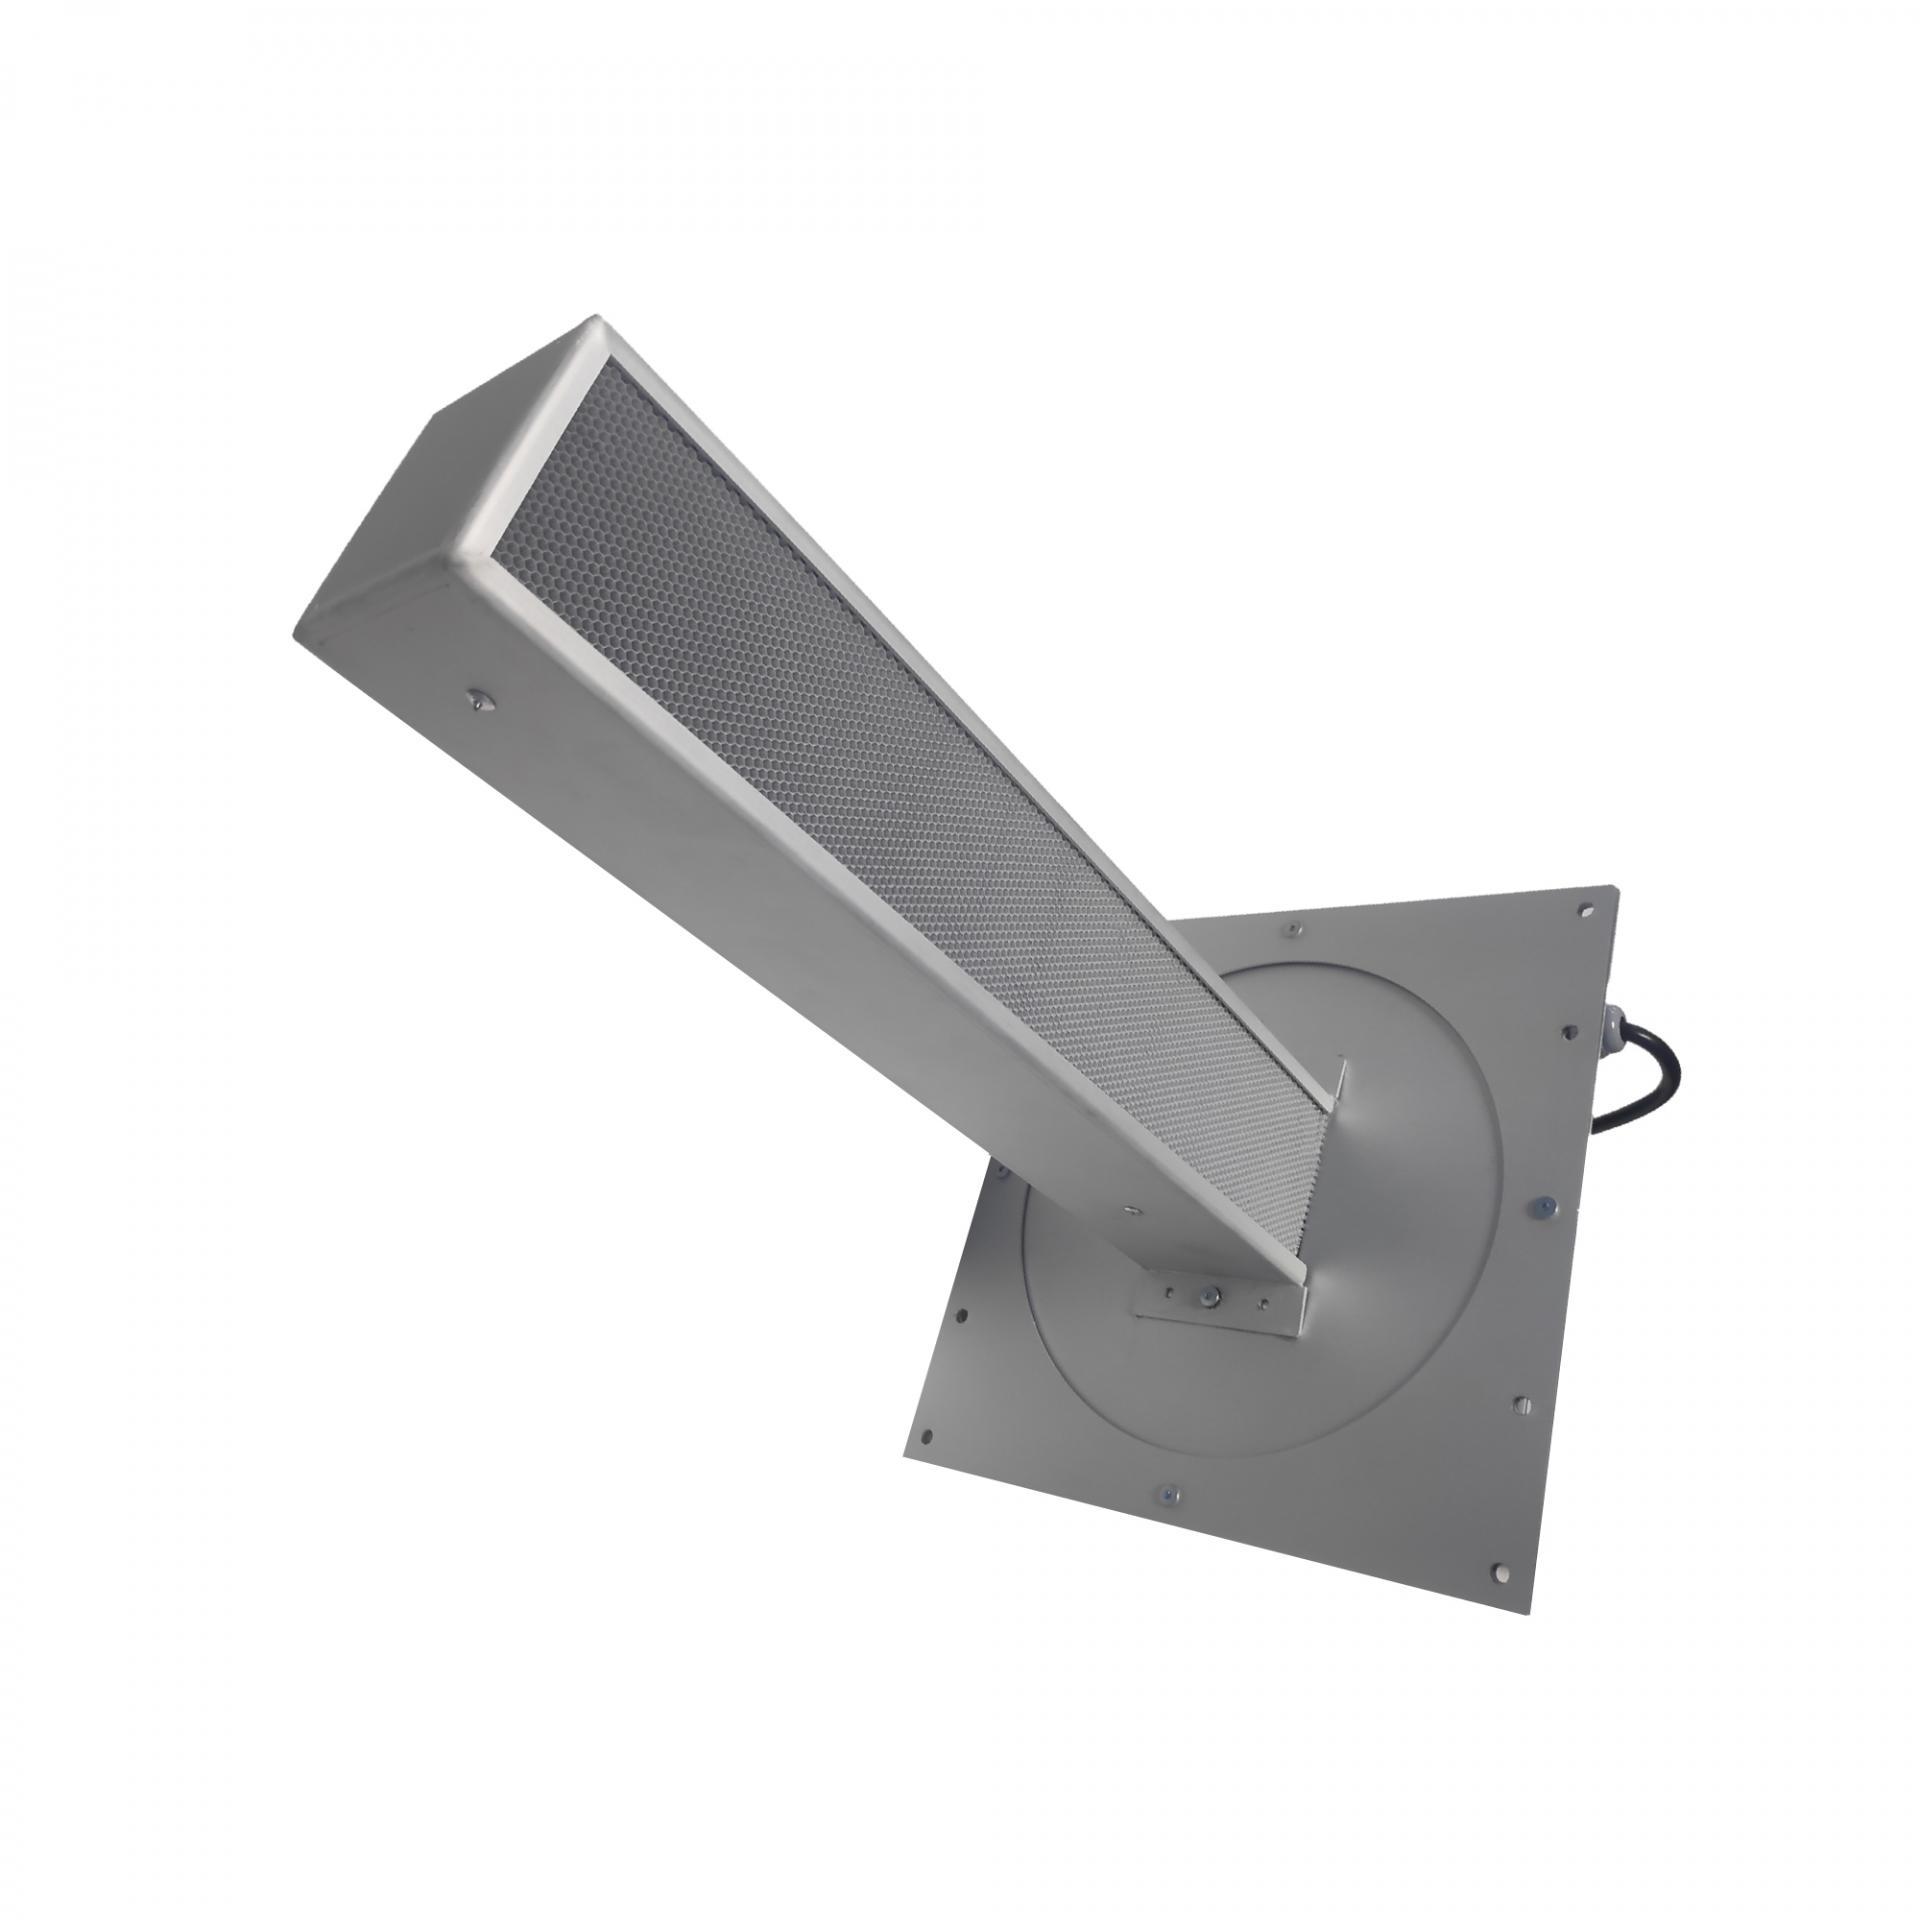 OAP 550 Célula de fotocatálisis y catálisis para conductos de aire